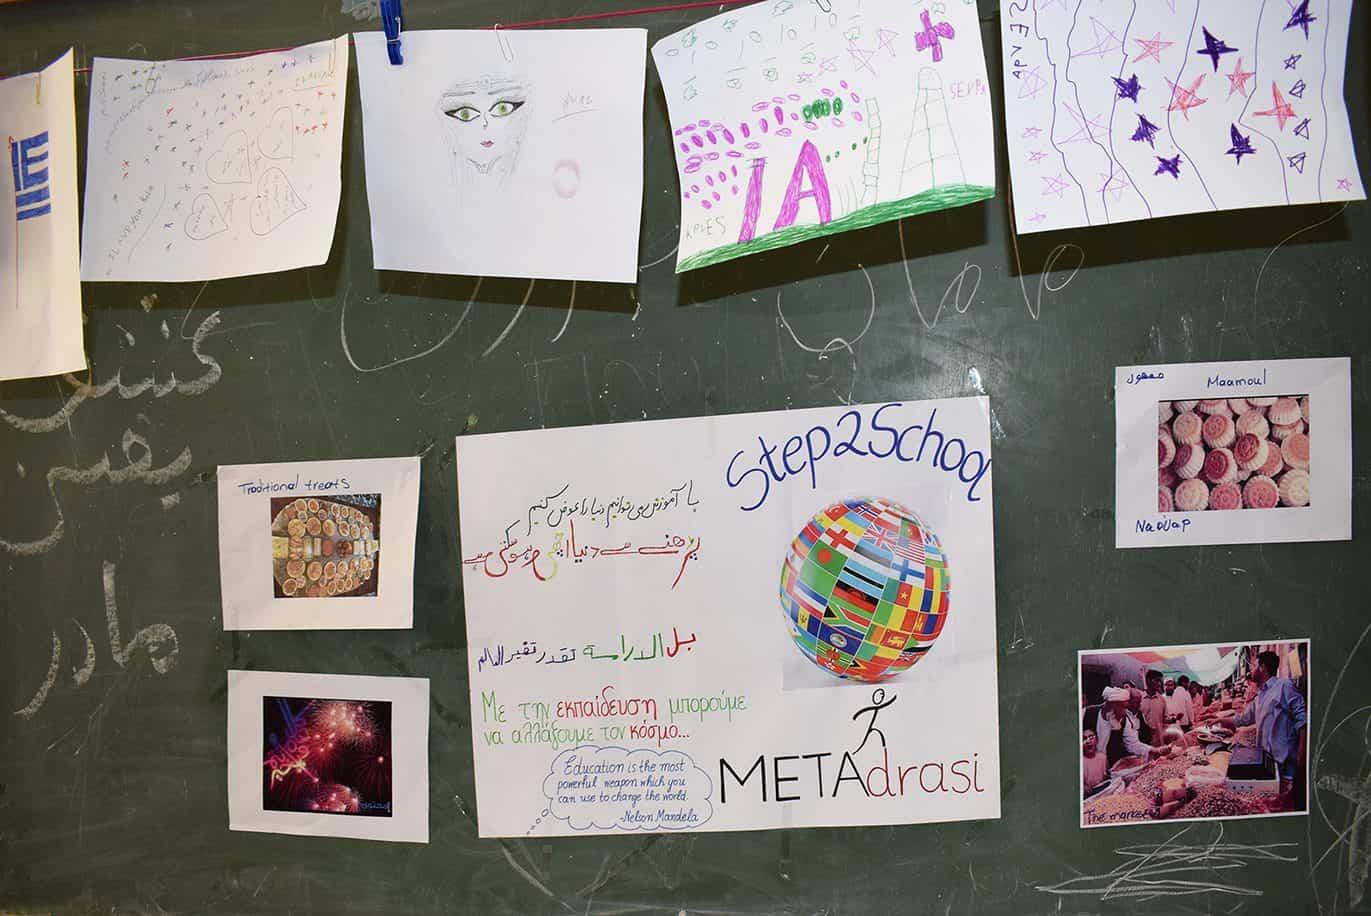 Metadrasi - Step2School celebration 5